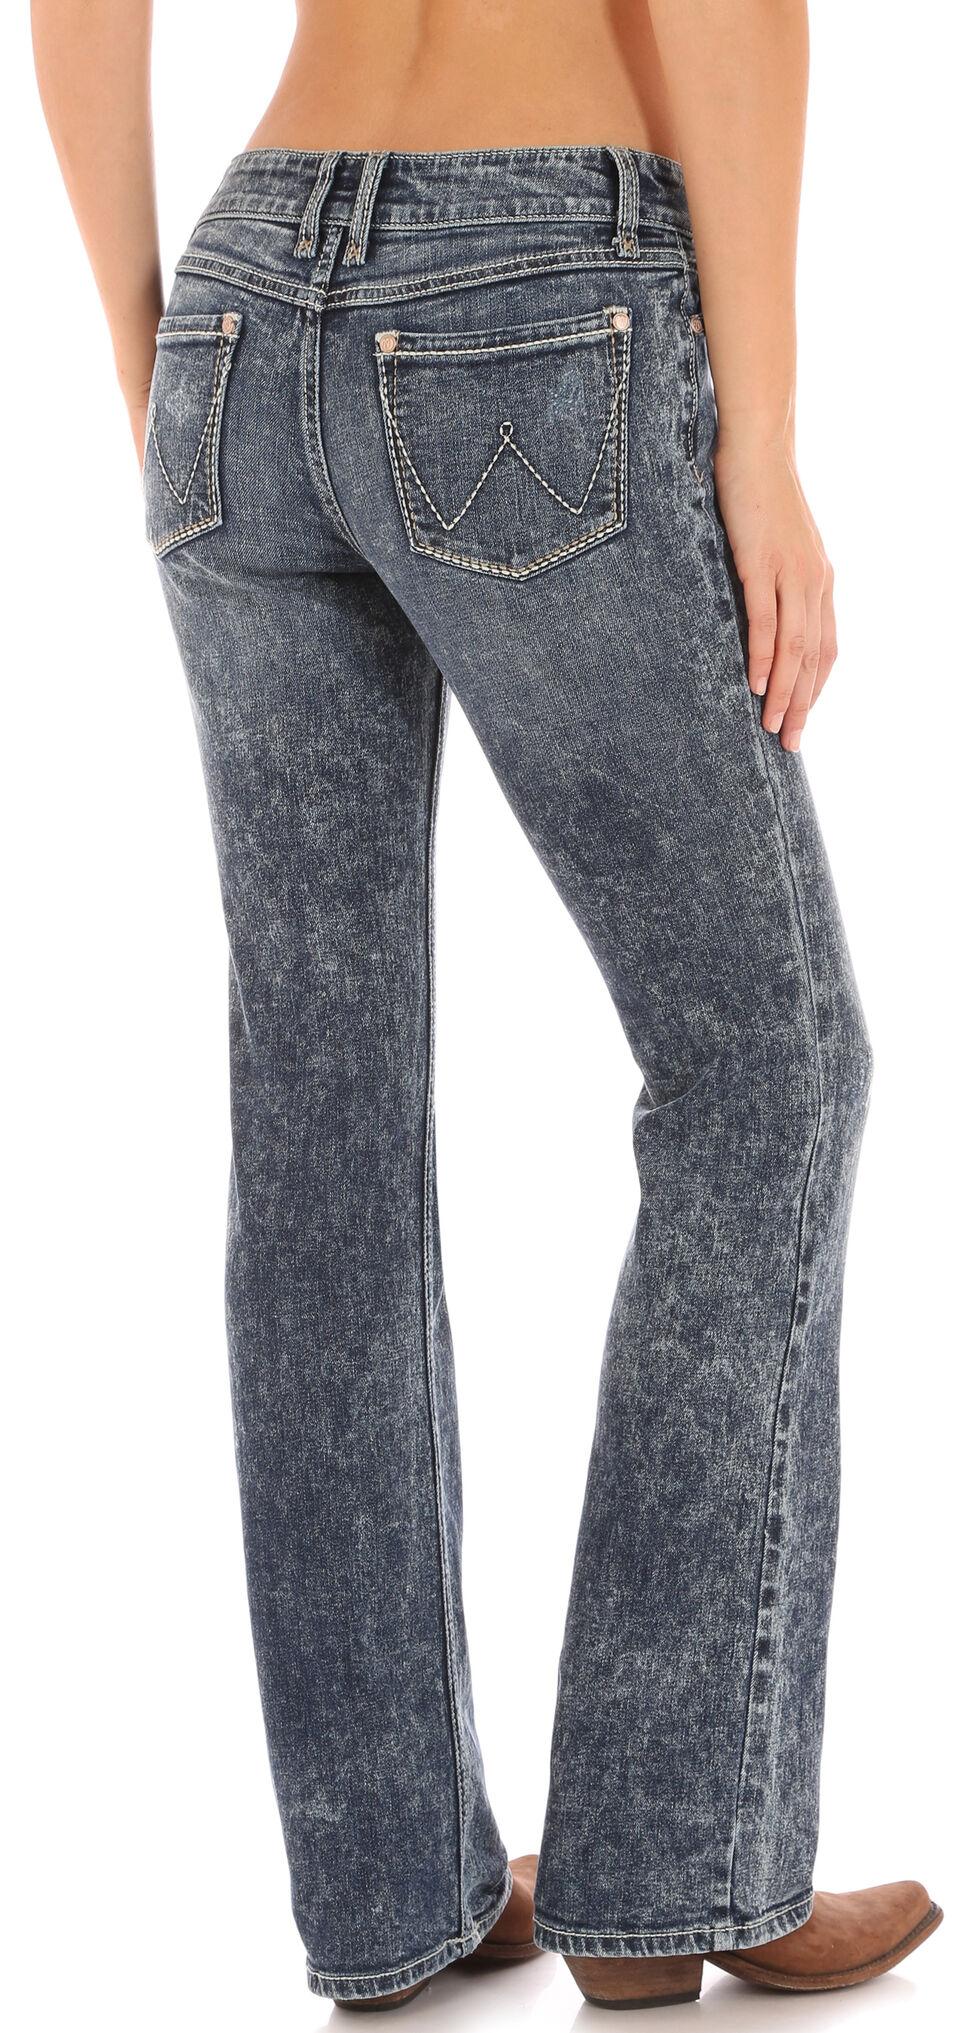 Wrangler Women's Bleach Wash Retro Sadie Jeans , Indigo, hi-res